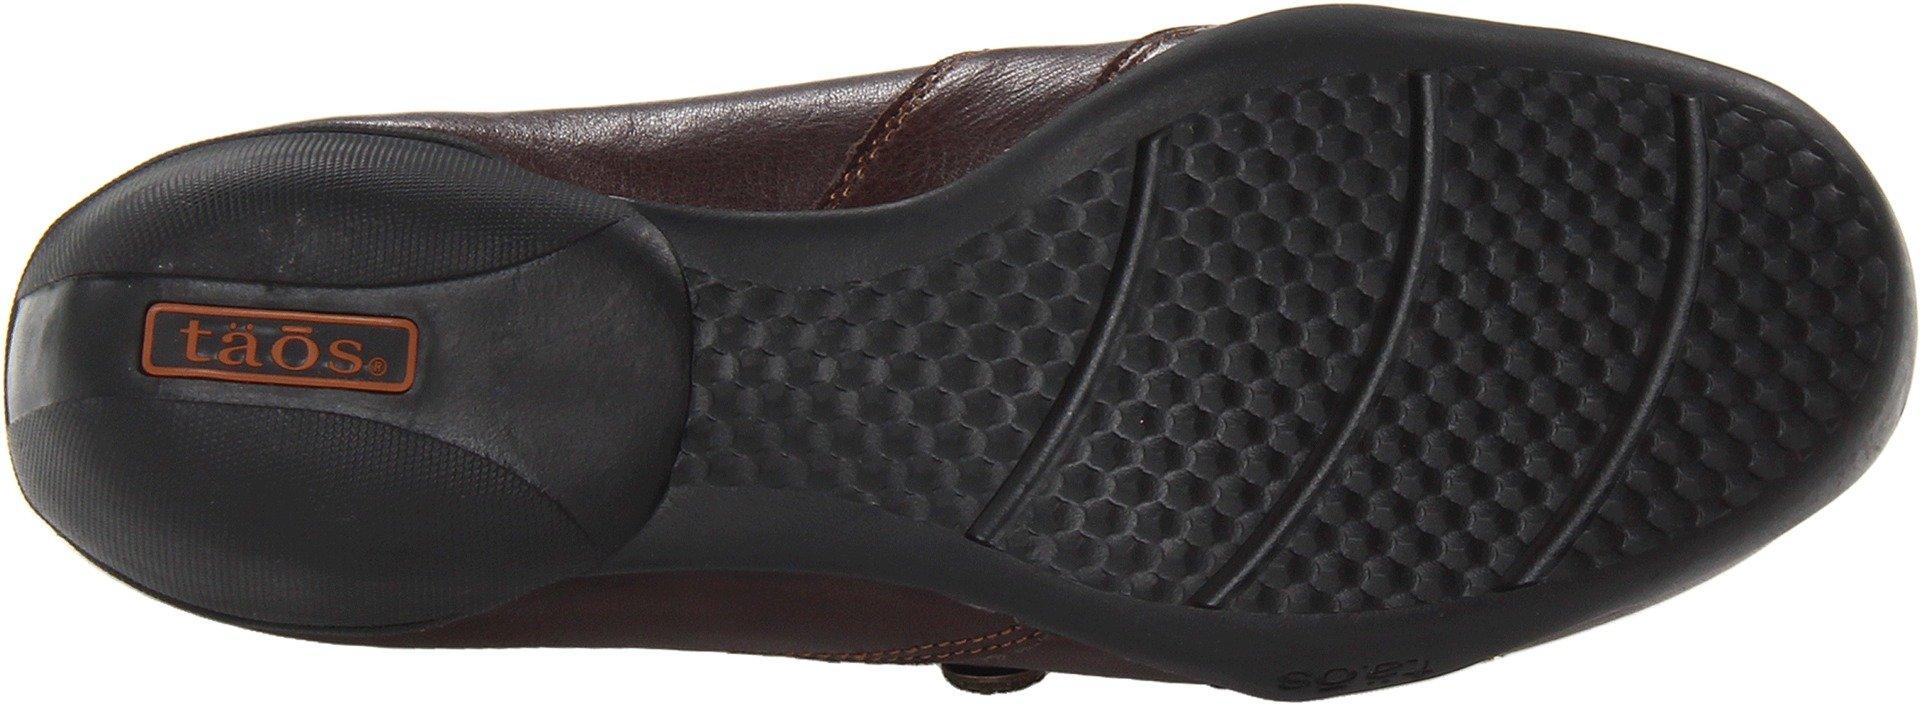 Taos Women's Encore Flat,Chocolate,7 M US by Taos Footwear (Image #3)